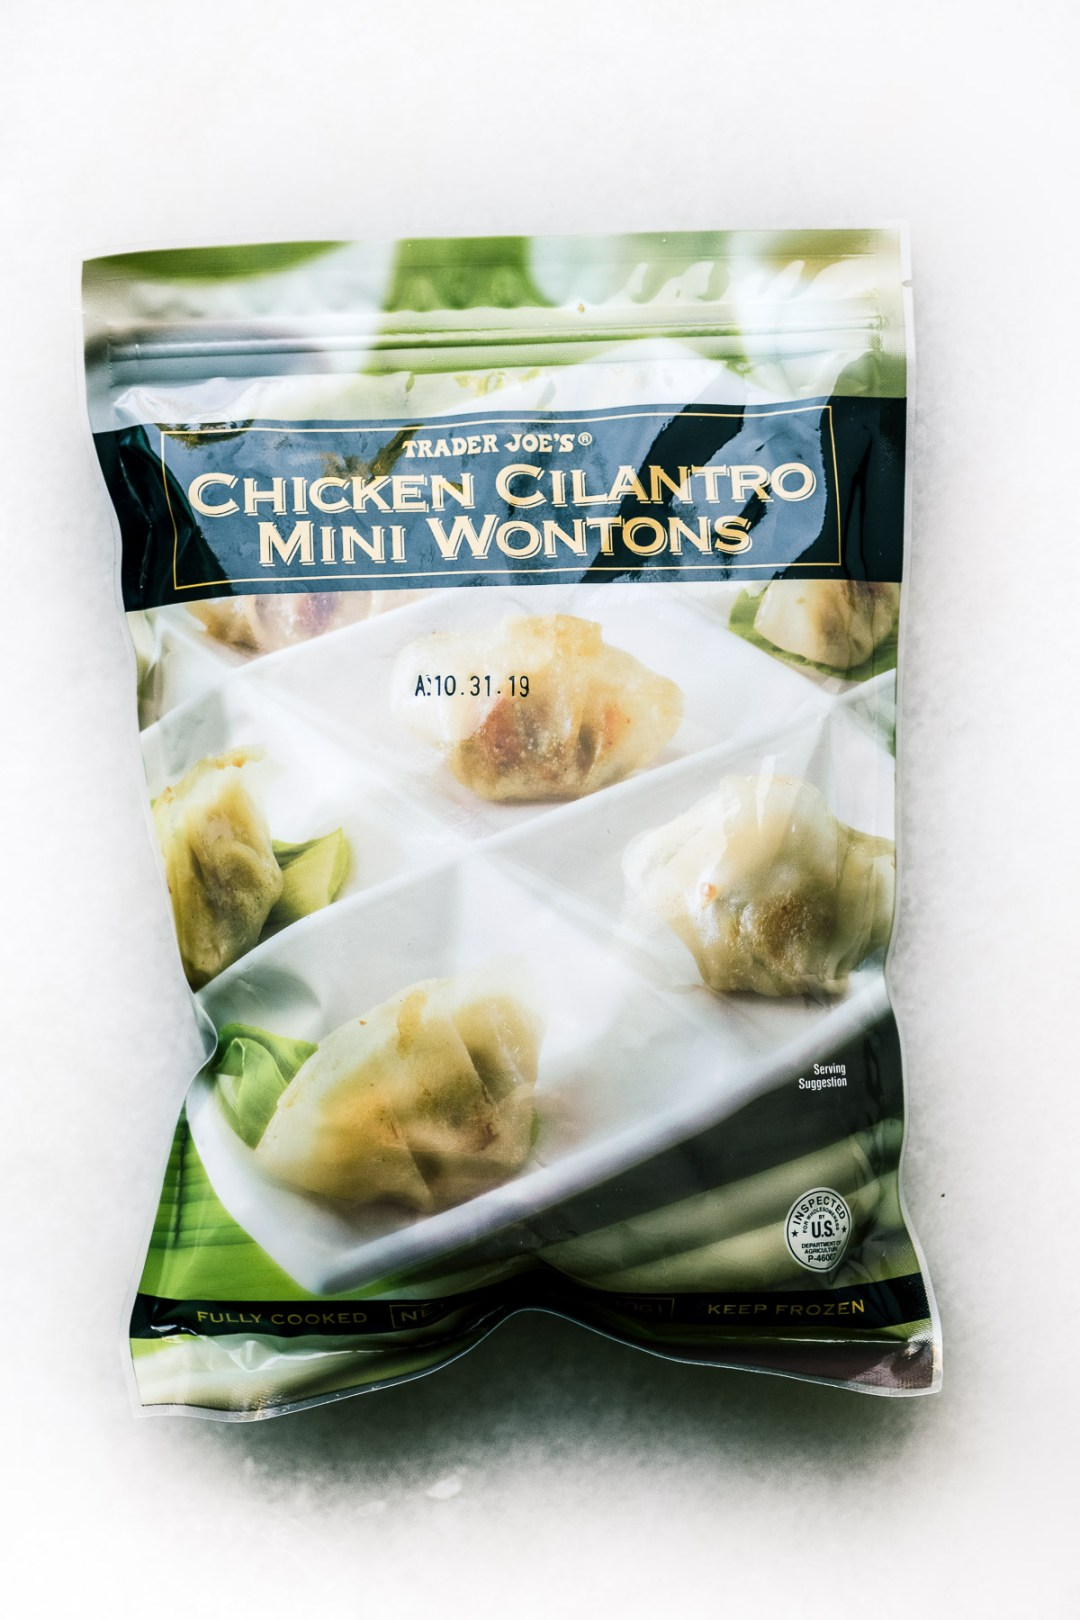 Trader Joe's Chicken Cilantro Wontons